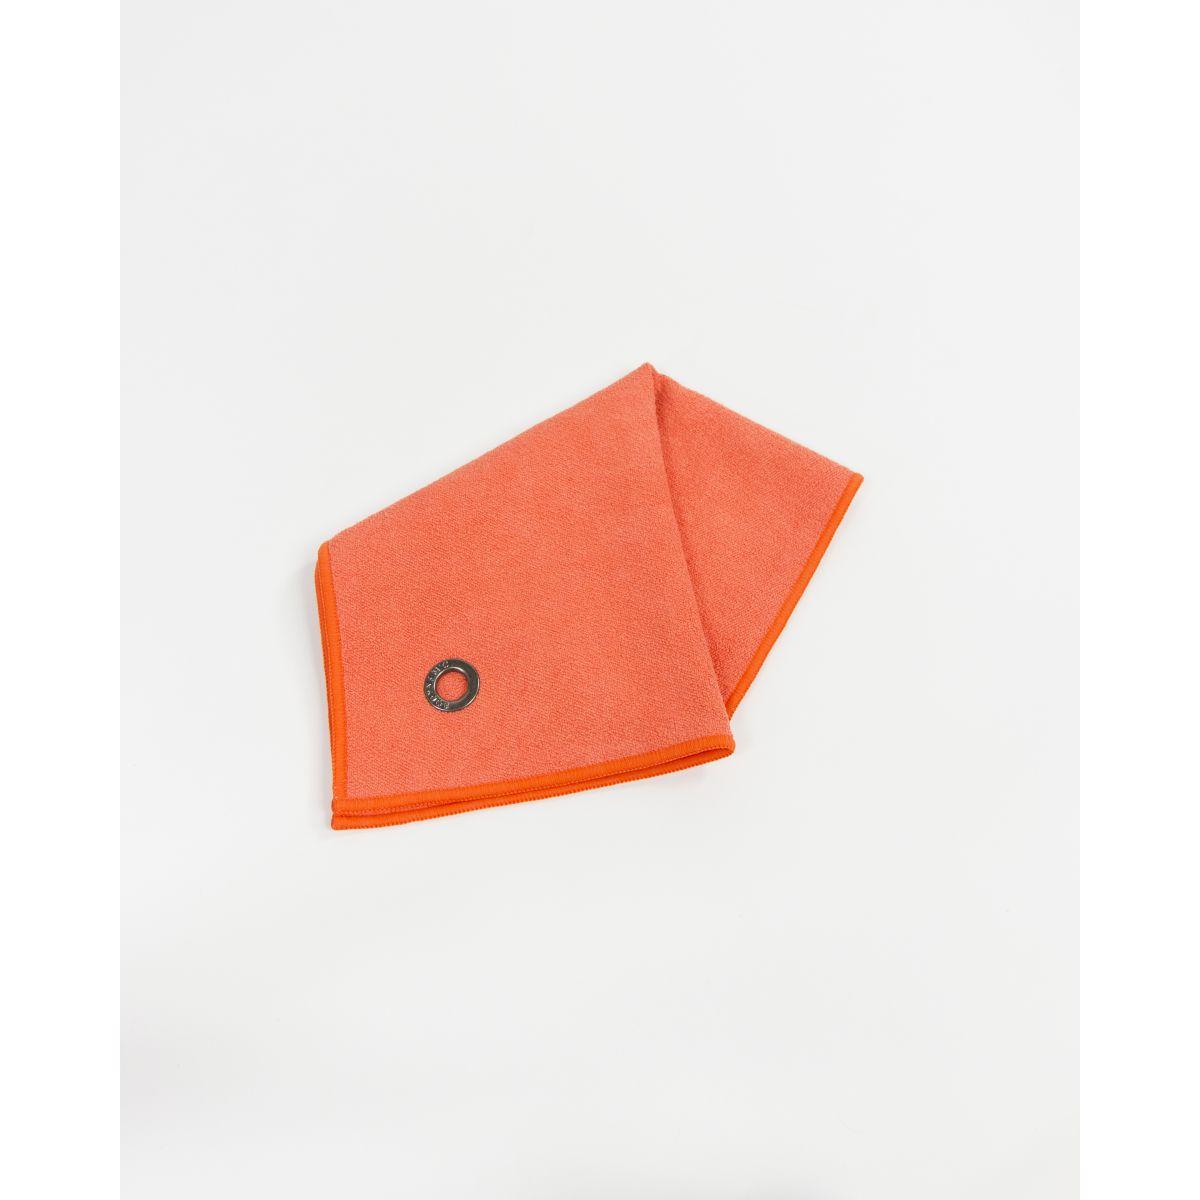 serviette mains visage microfibre anuanua orange volcan bodynamic. Black Bedroom Furniture Sets. Home Design Ideas